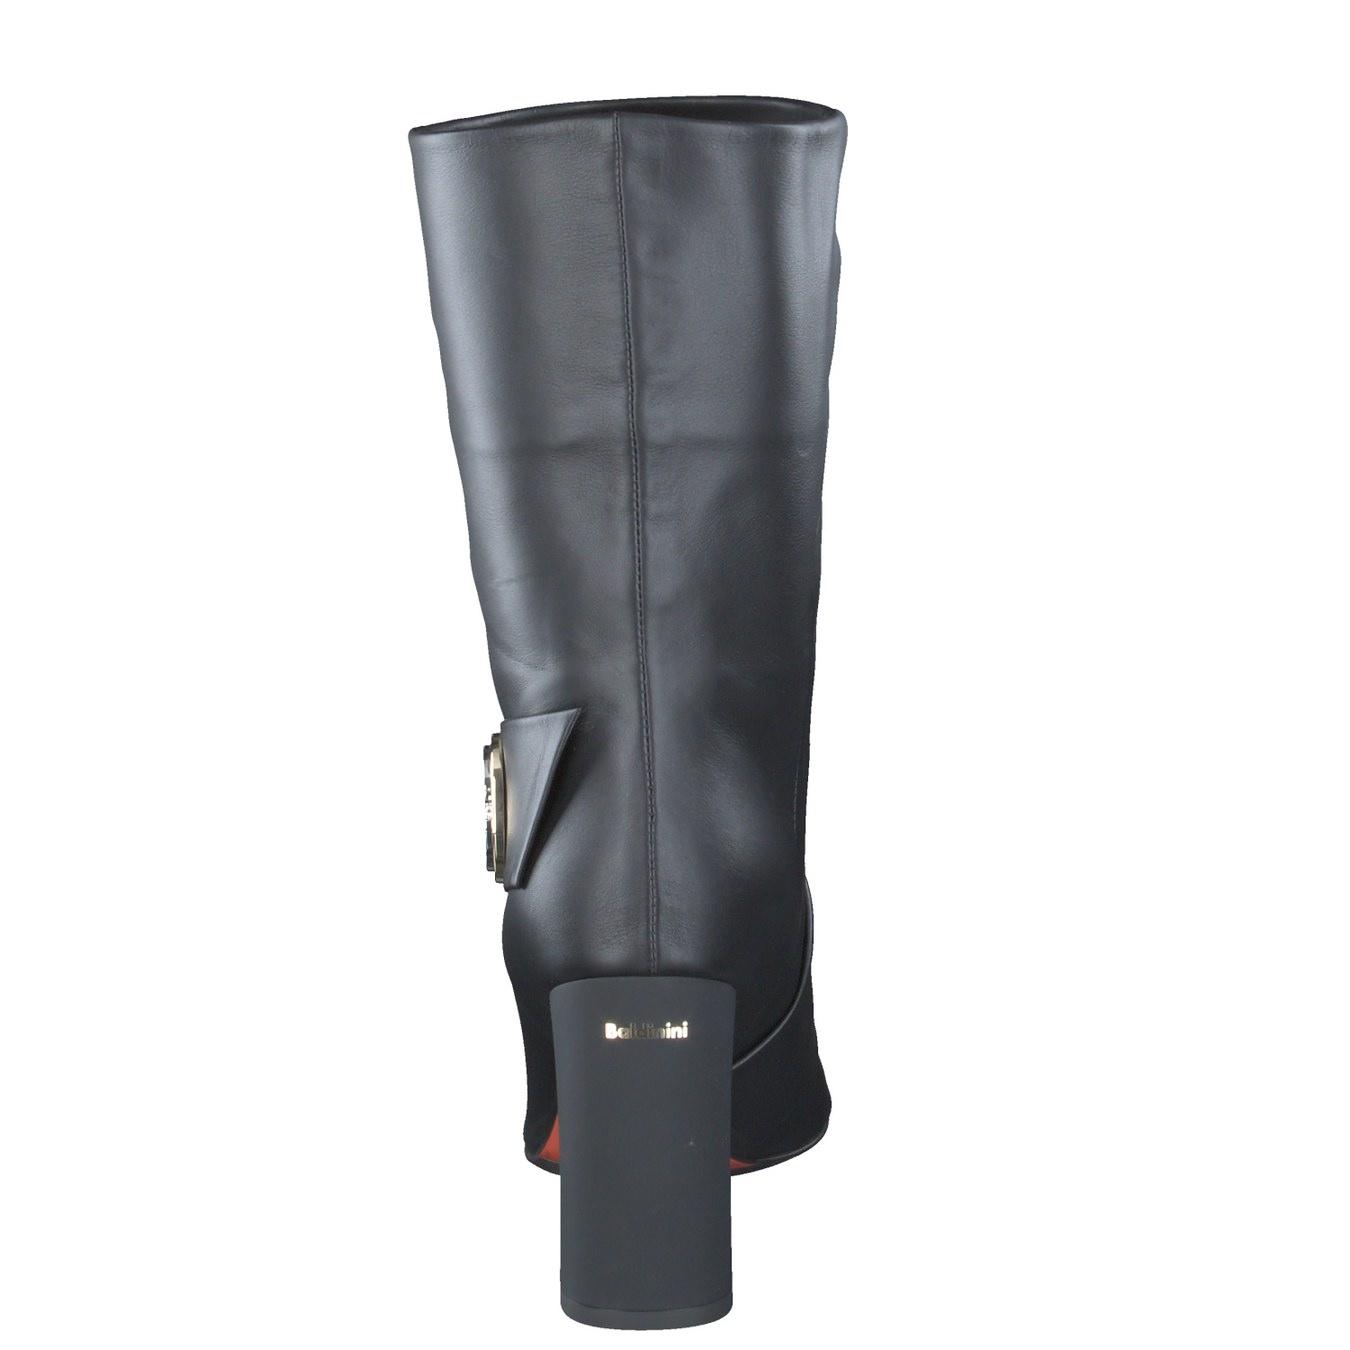 e5d43b2681a99 Baldinini Damen Stiefel in schwarz kaufen   Zumnorde Online-Shop